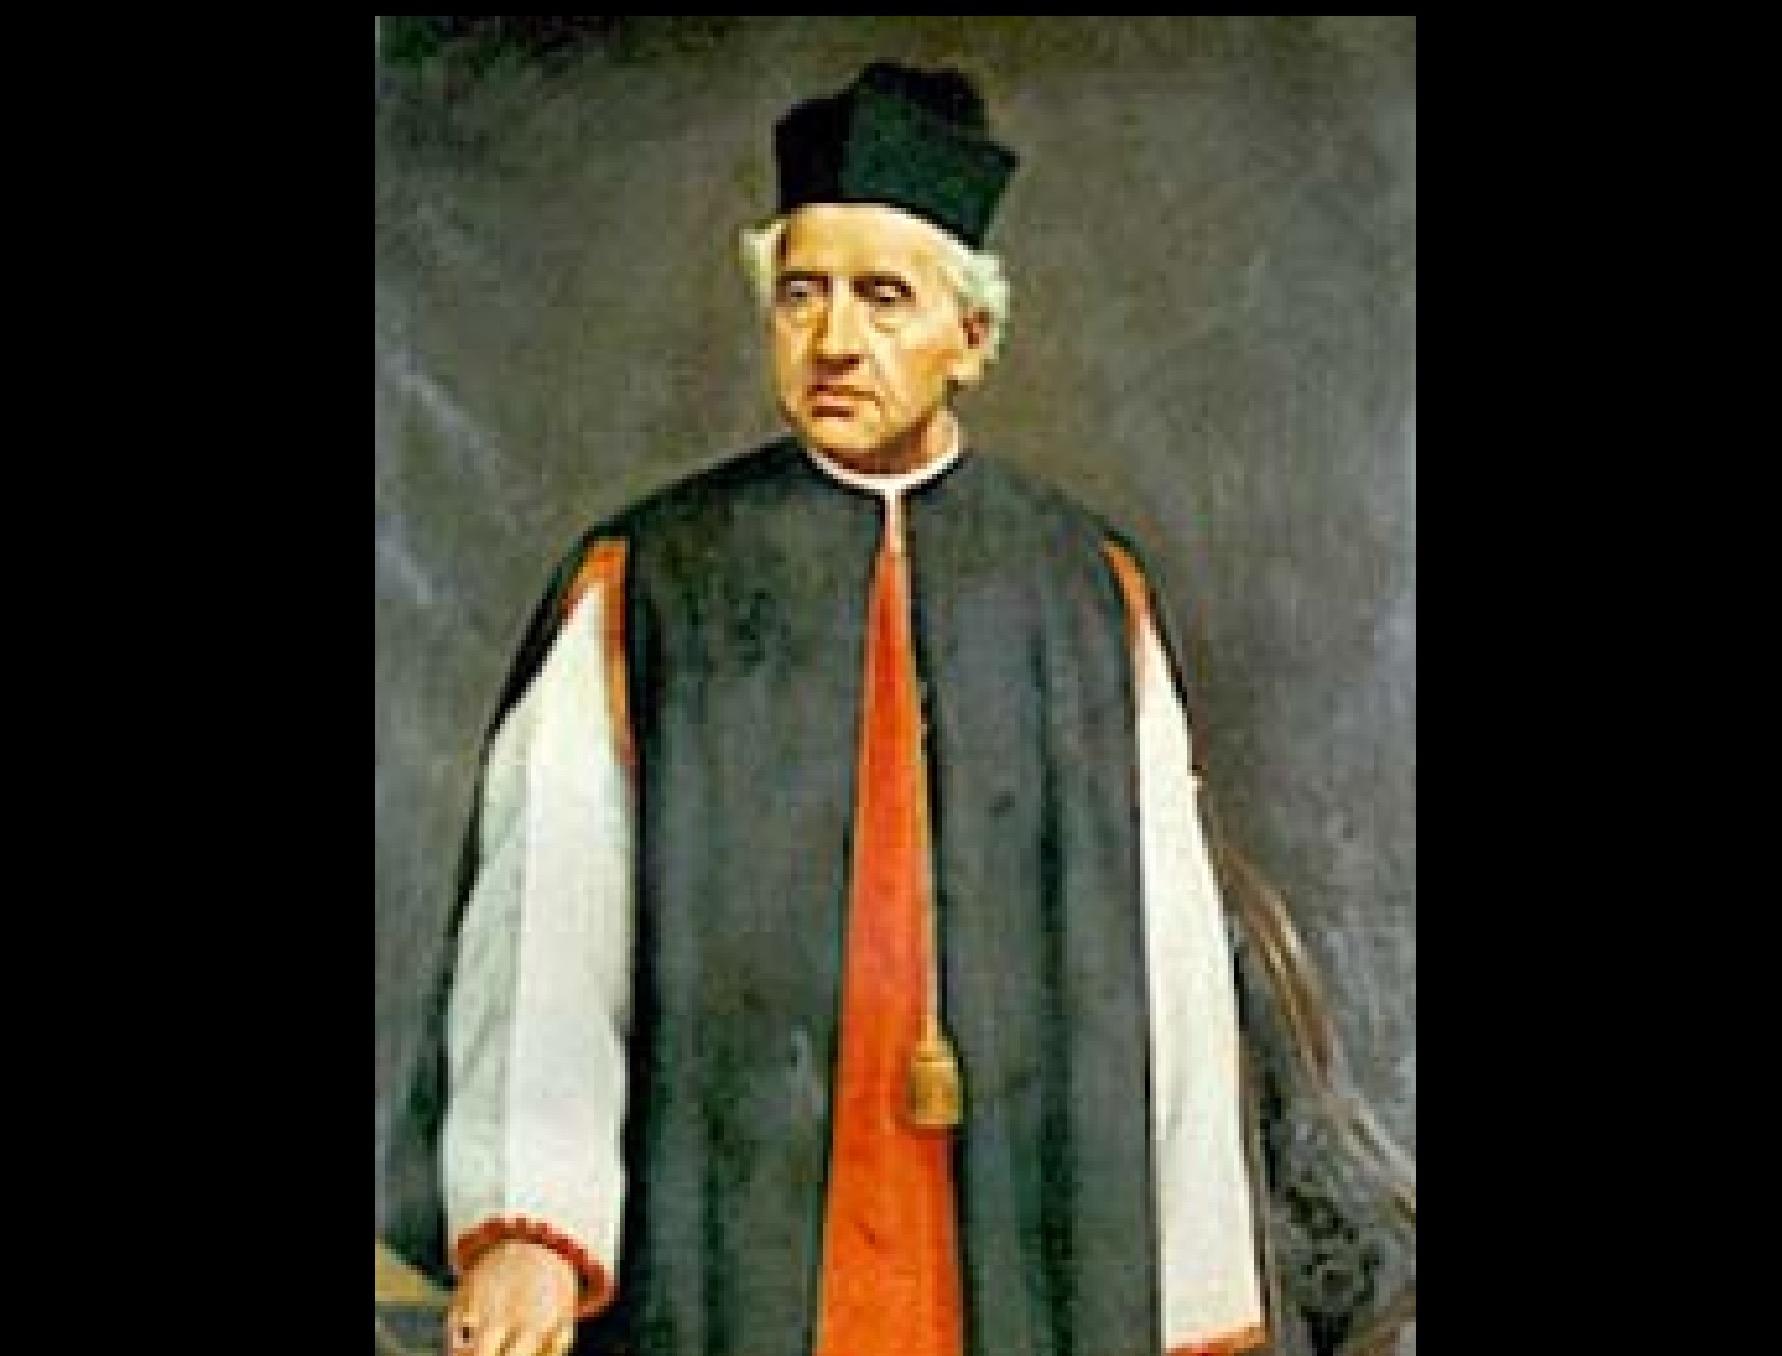 Beato Luigi Biraghi